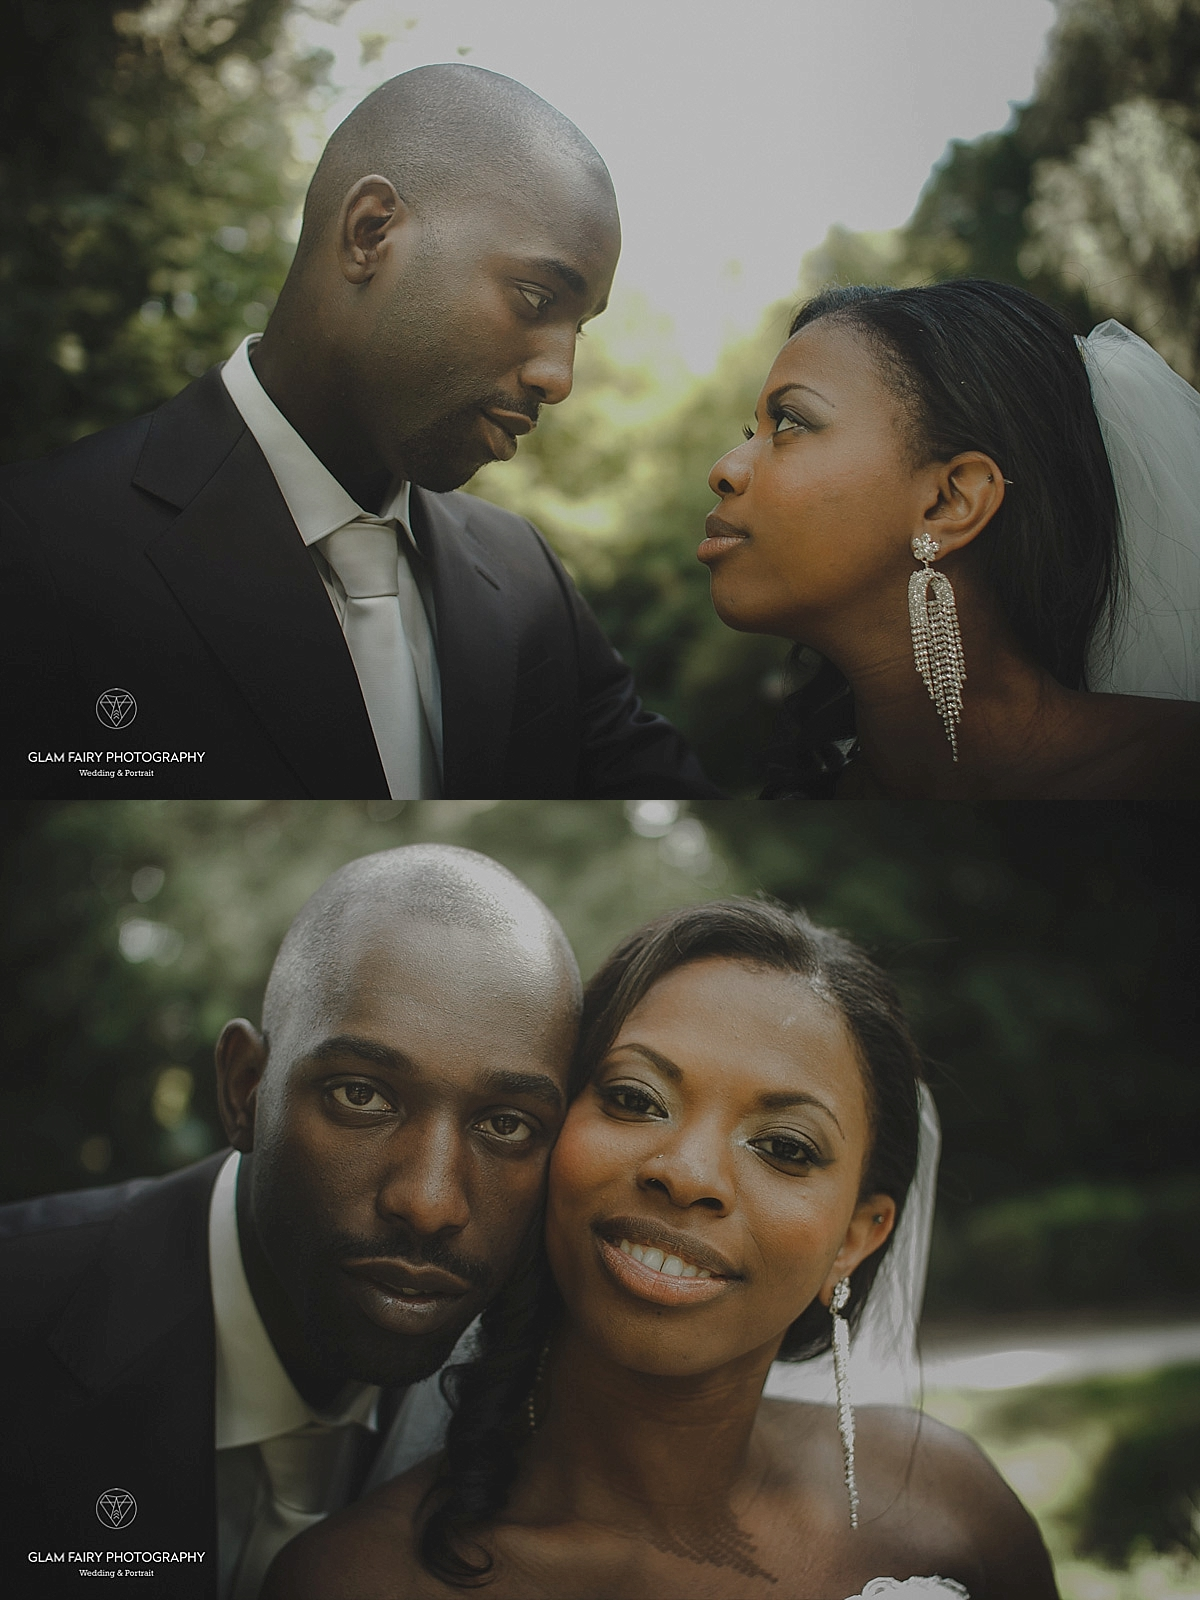 GlamFairyPhotography-mariage-afro-antillais-orsay-candy_0023